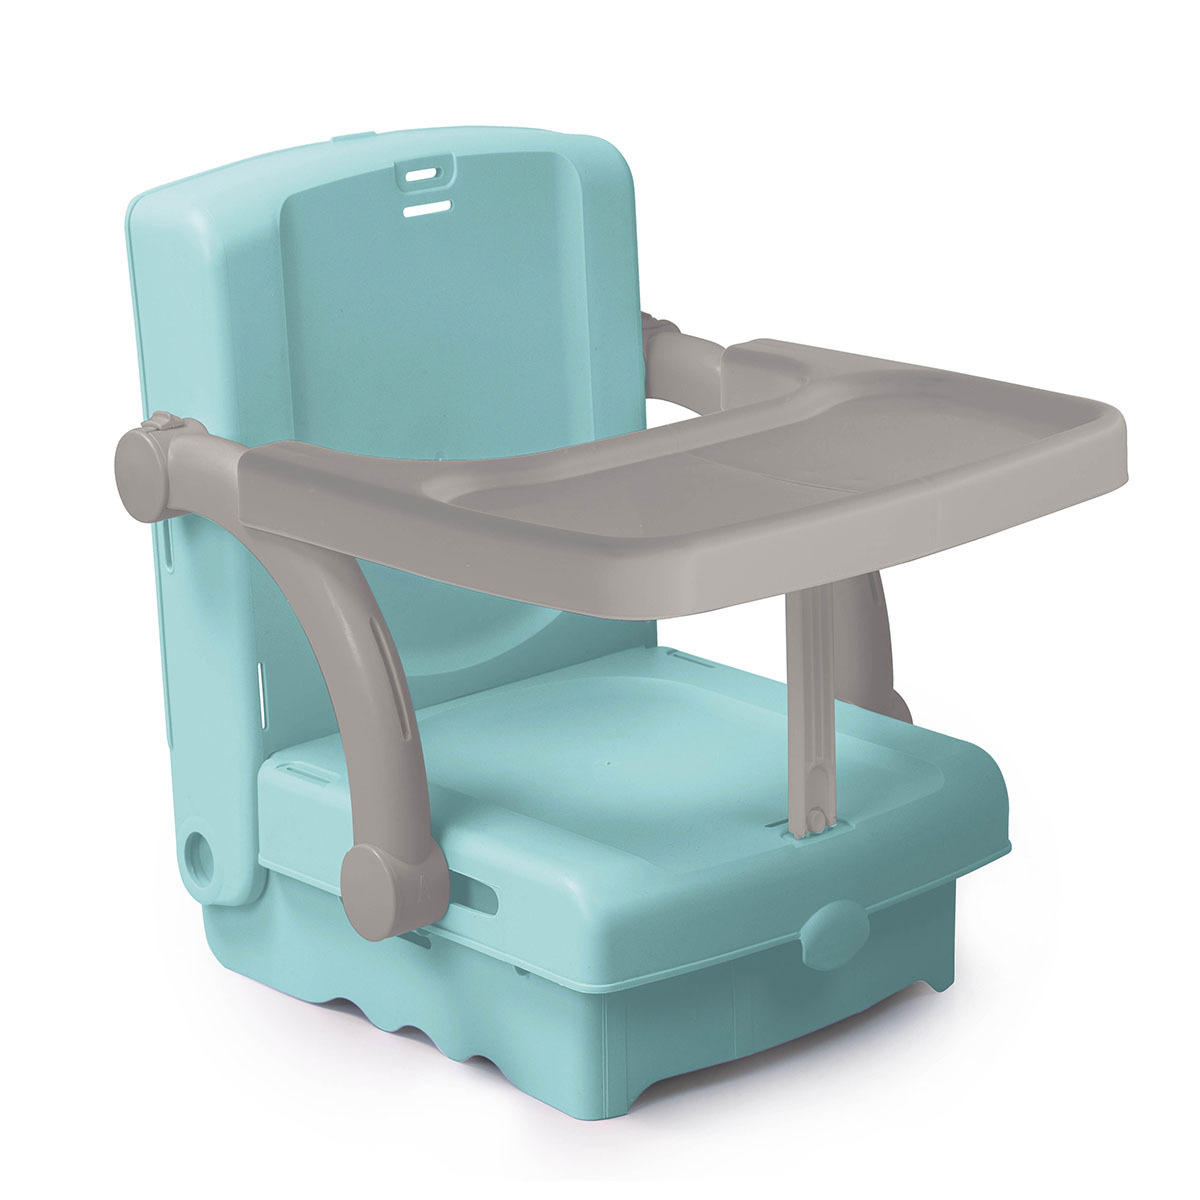 Buki france rehausseur chaise haute vert gris chaise - Rehausseur de chaise auchan ...